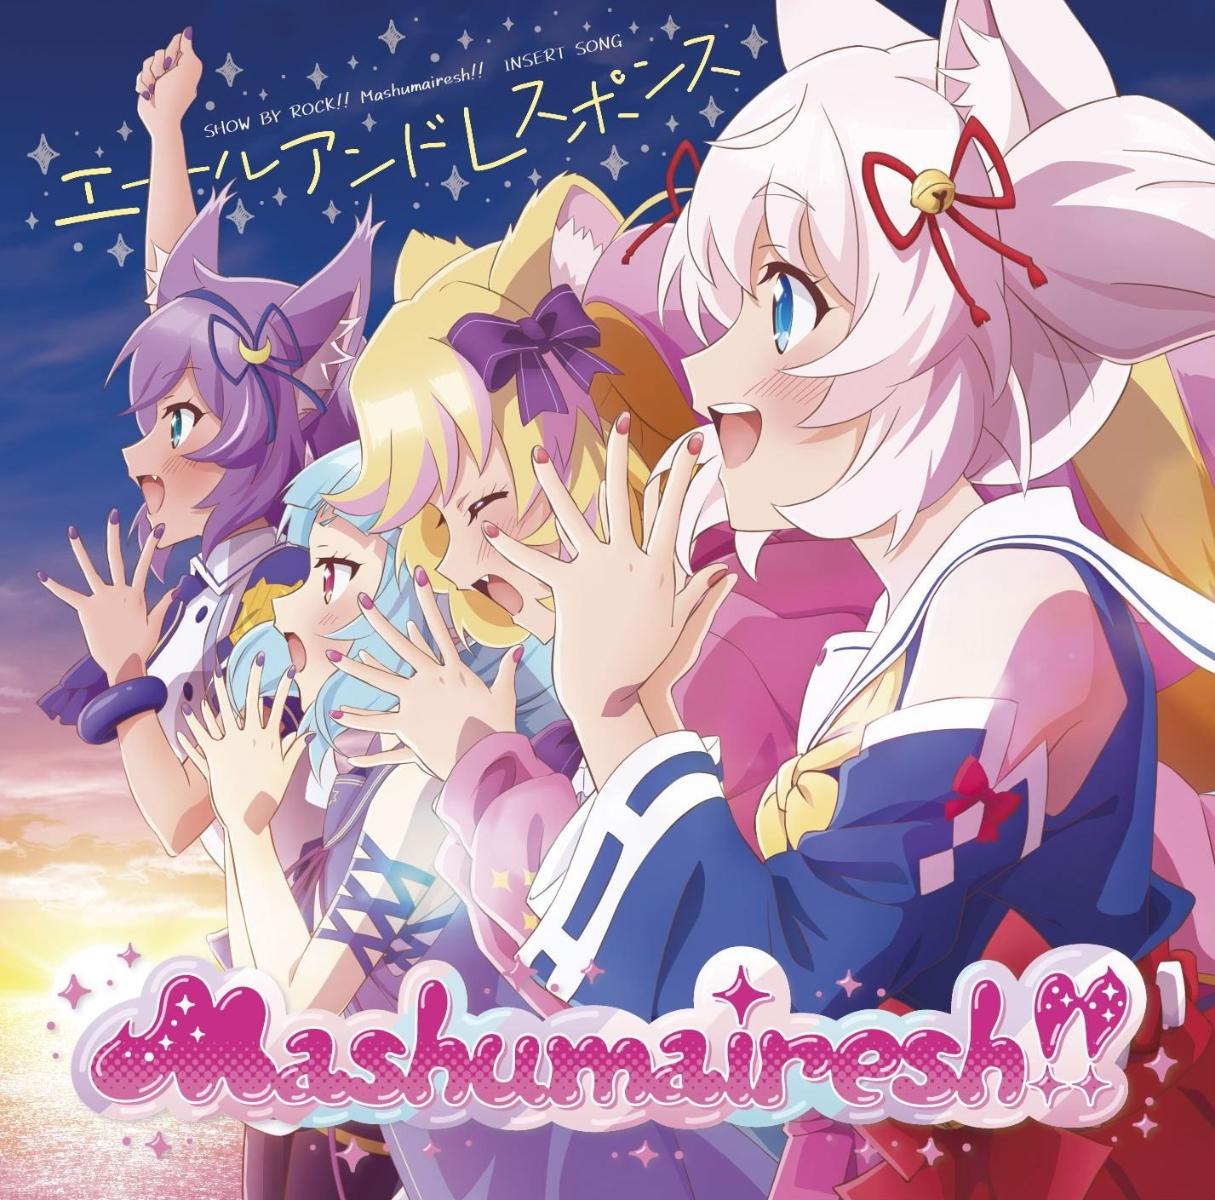 SHOW BY ROCK!! Mashumairesh!!: Yell and Response / エールアンドレスポンス